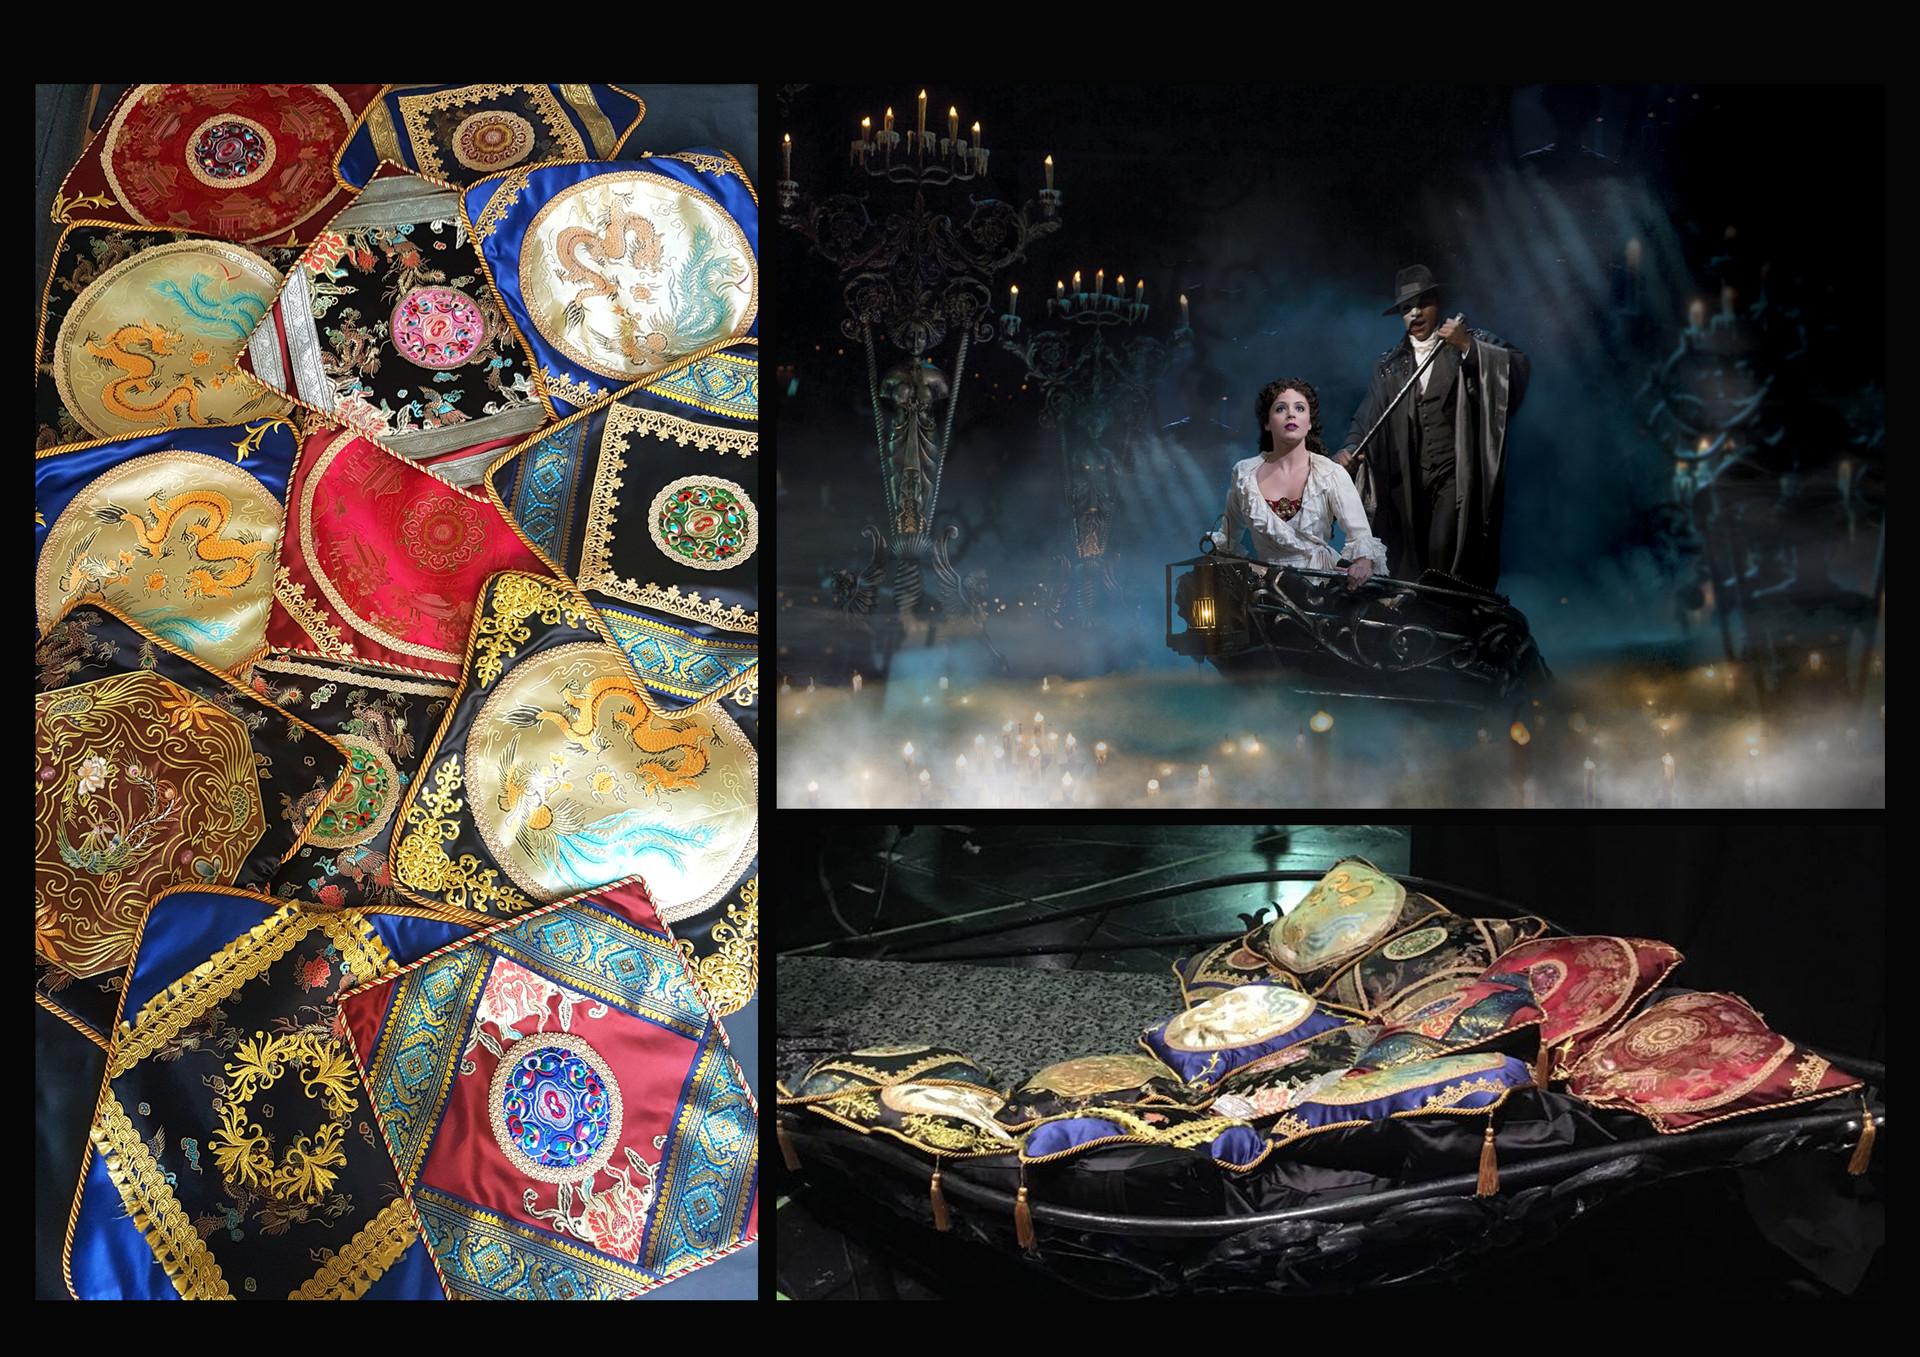 'Phantom of the Opera', touring production, June 2018